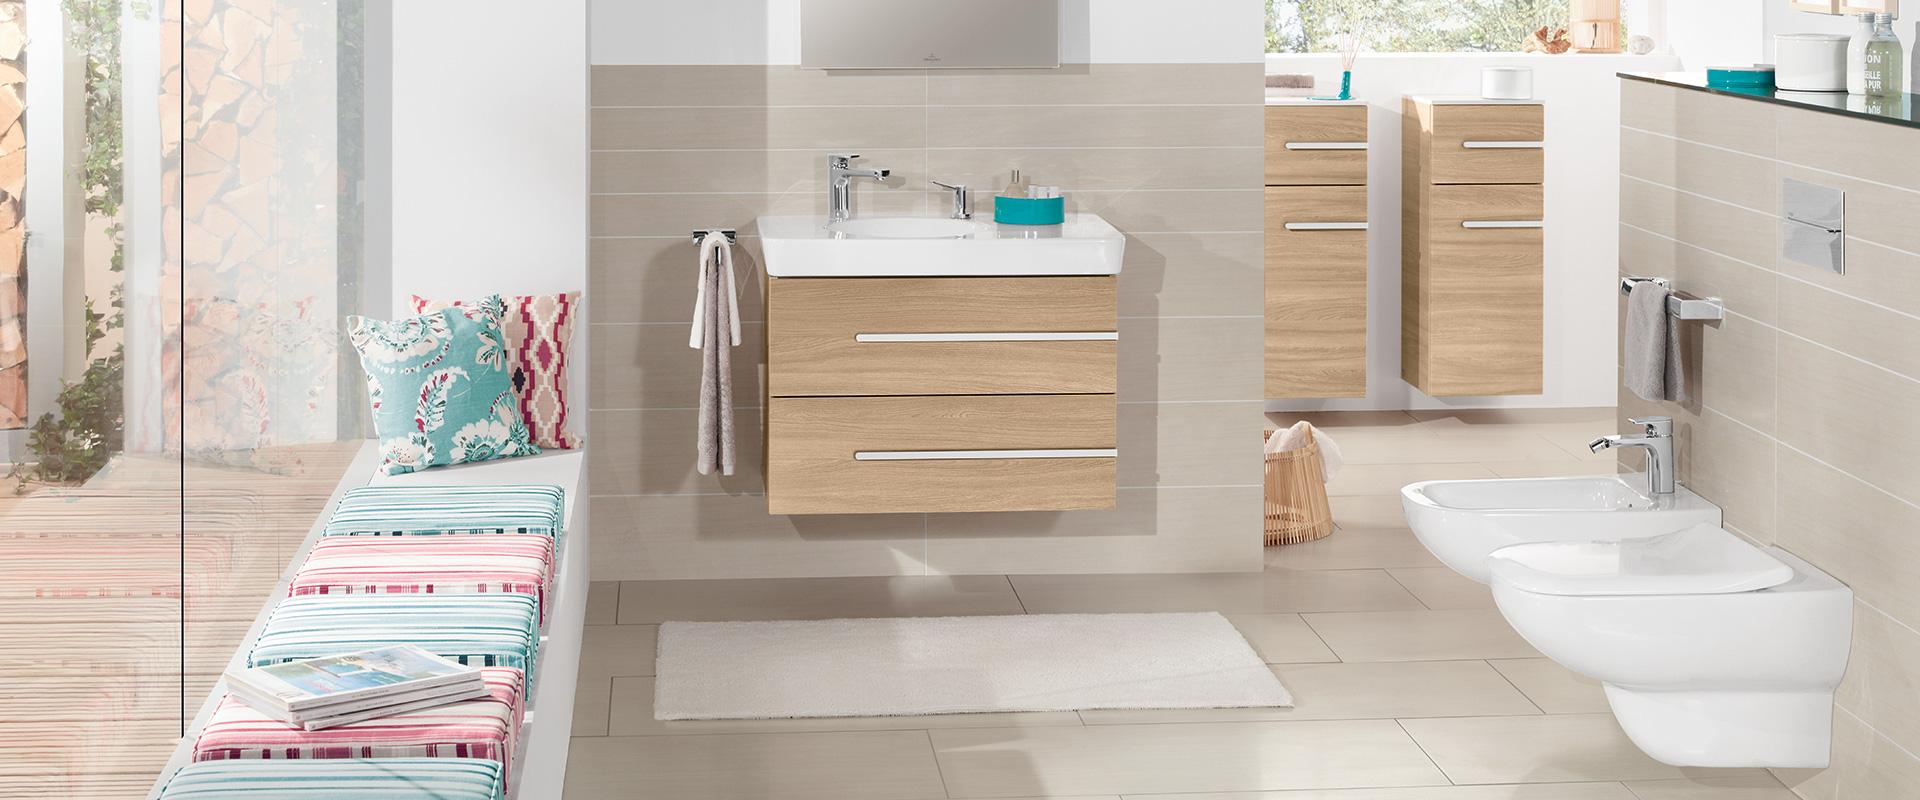 Villeroy Boch Badezimmer Jtleighcom Hausgestaltung Ideen  U003e Villeroy Boch  Badezimmer Set